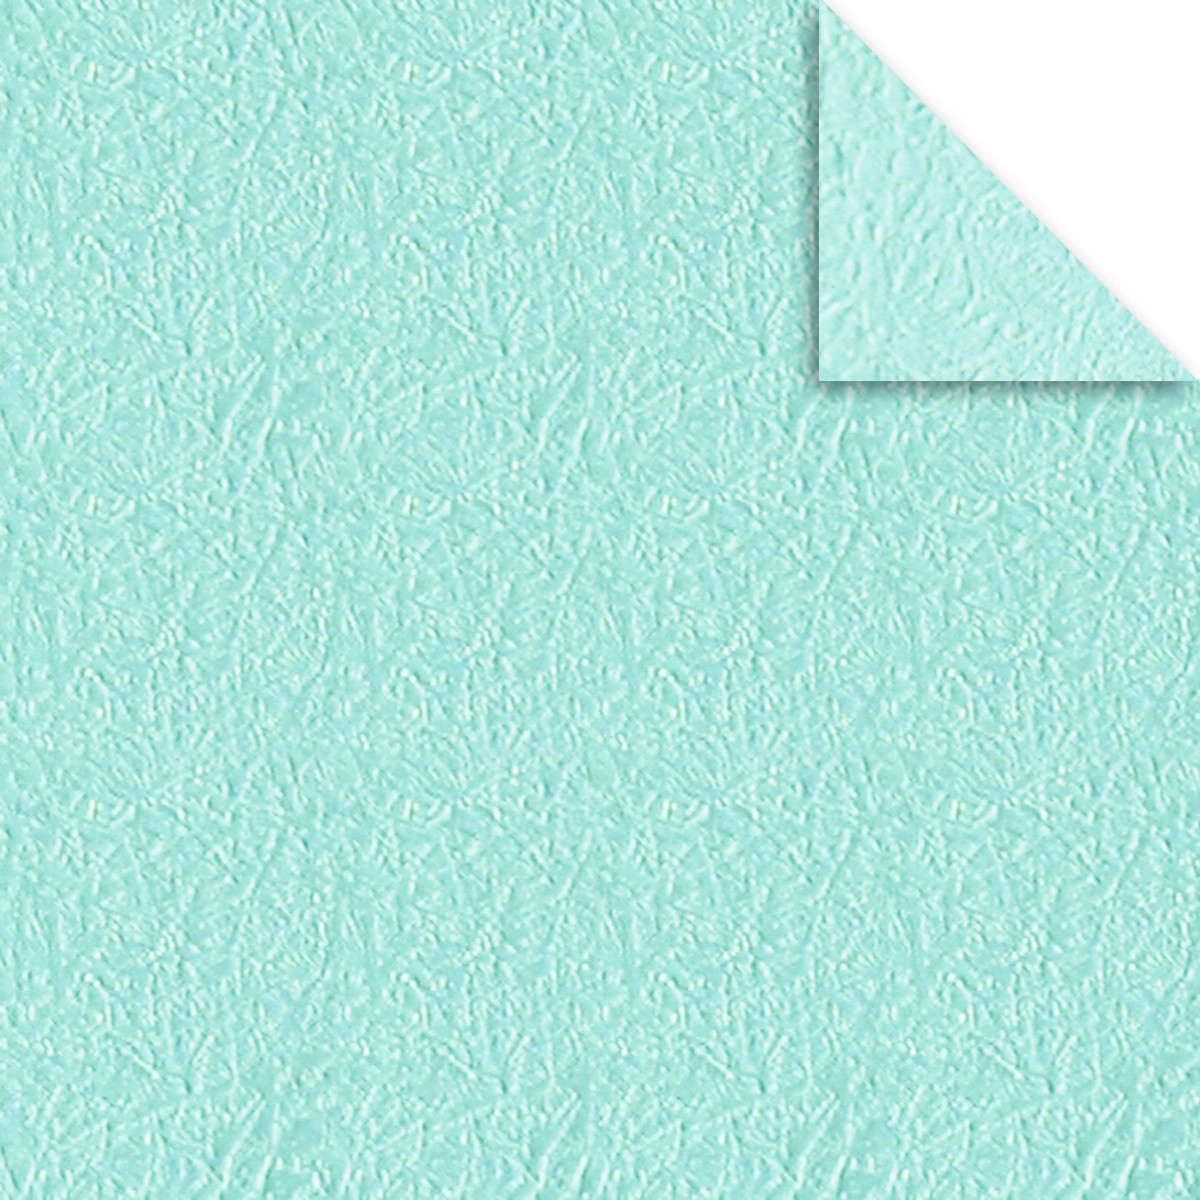 faltbl tter aurelio stern crush paper mint 15 x 15 cm buntpapierwelt. Black Bedroom Furniture Sets. Home Design Ideas